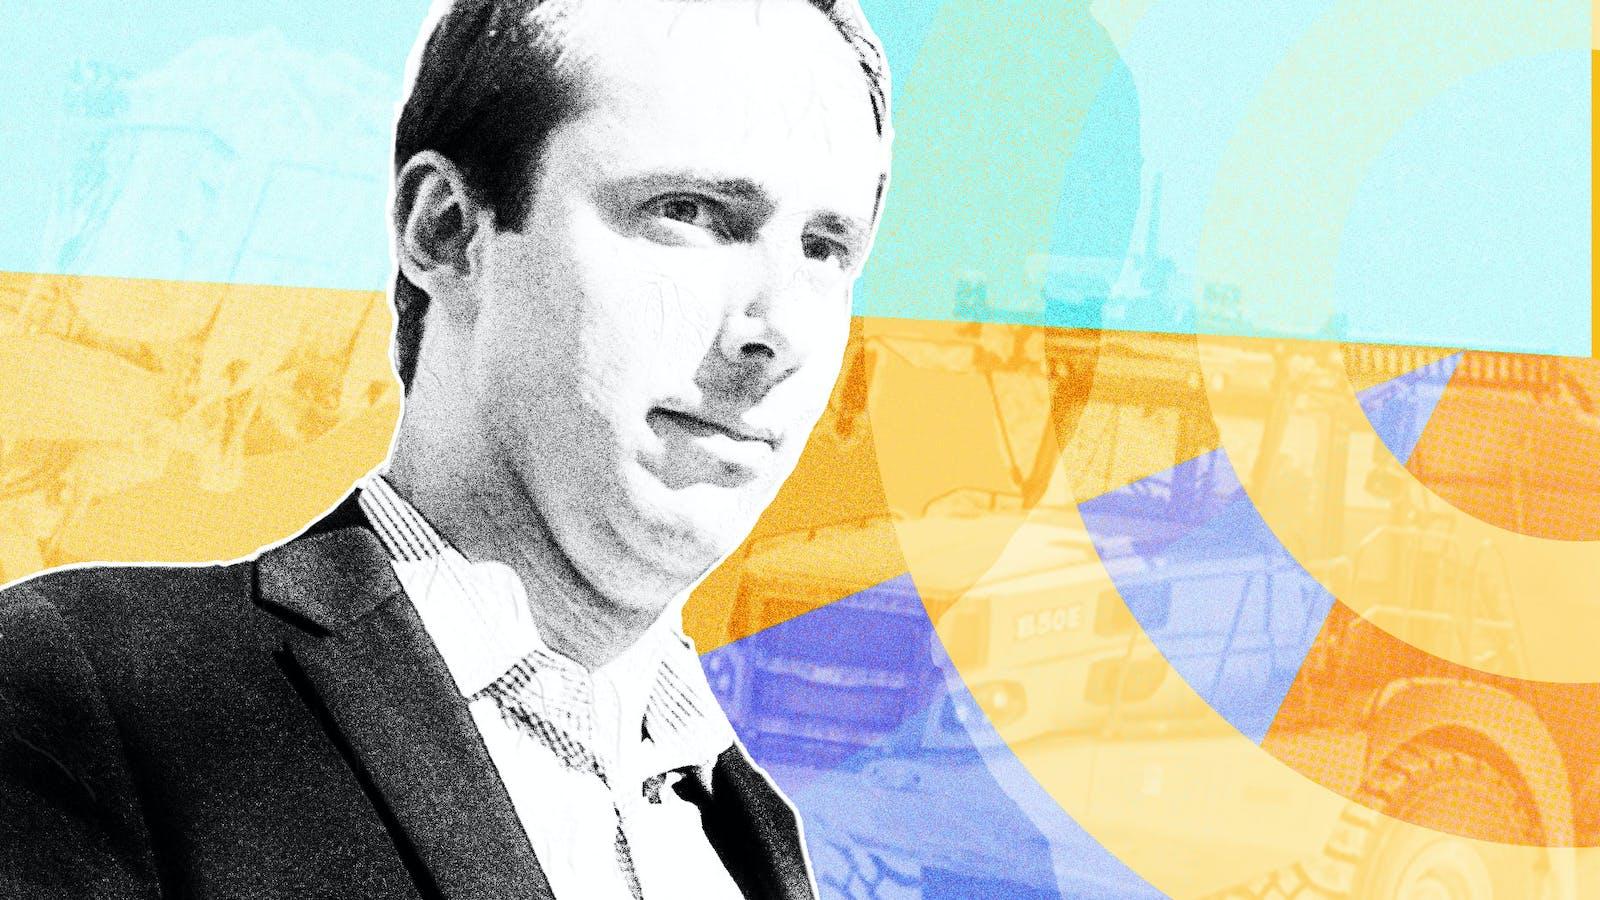 Anthony Levandowski. Photos by Bloomberg, Pronto.ai (truck). Art by Mike Sullivan.